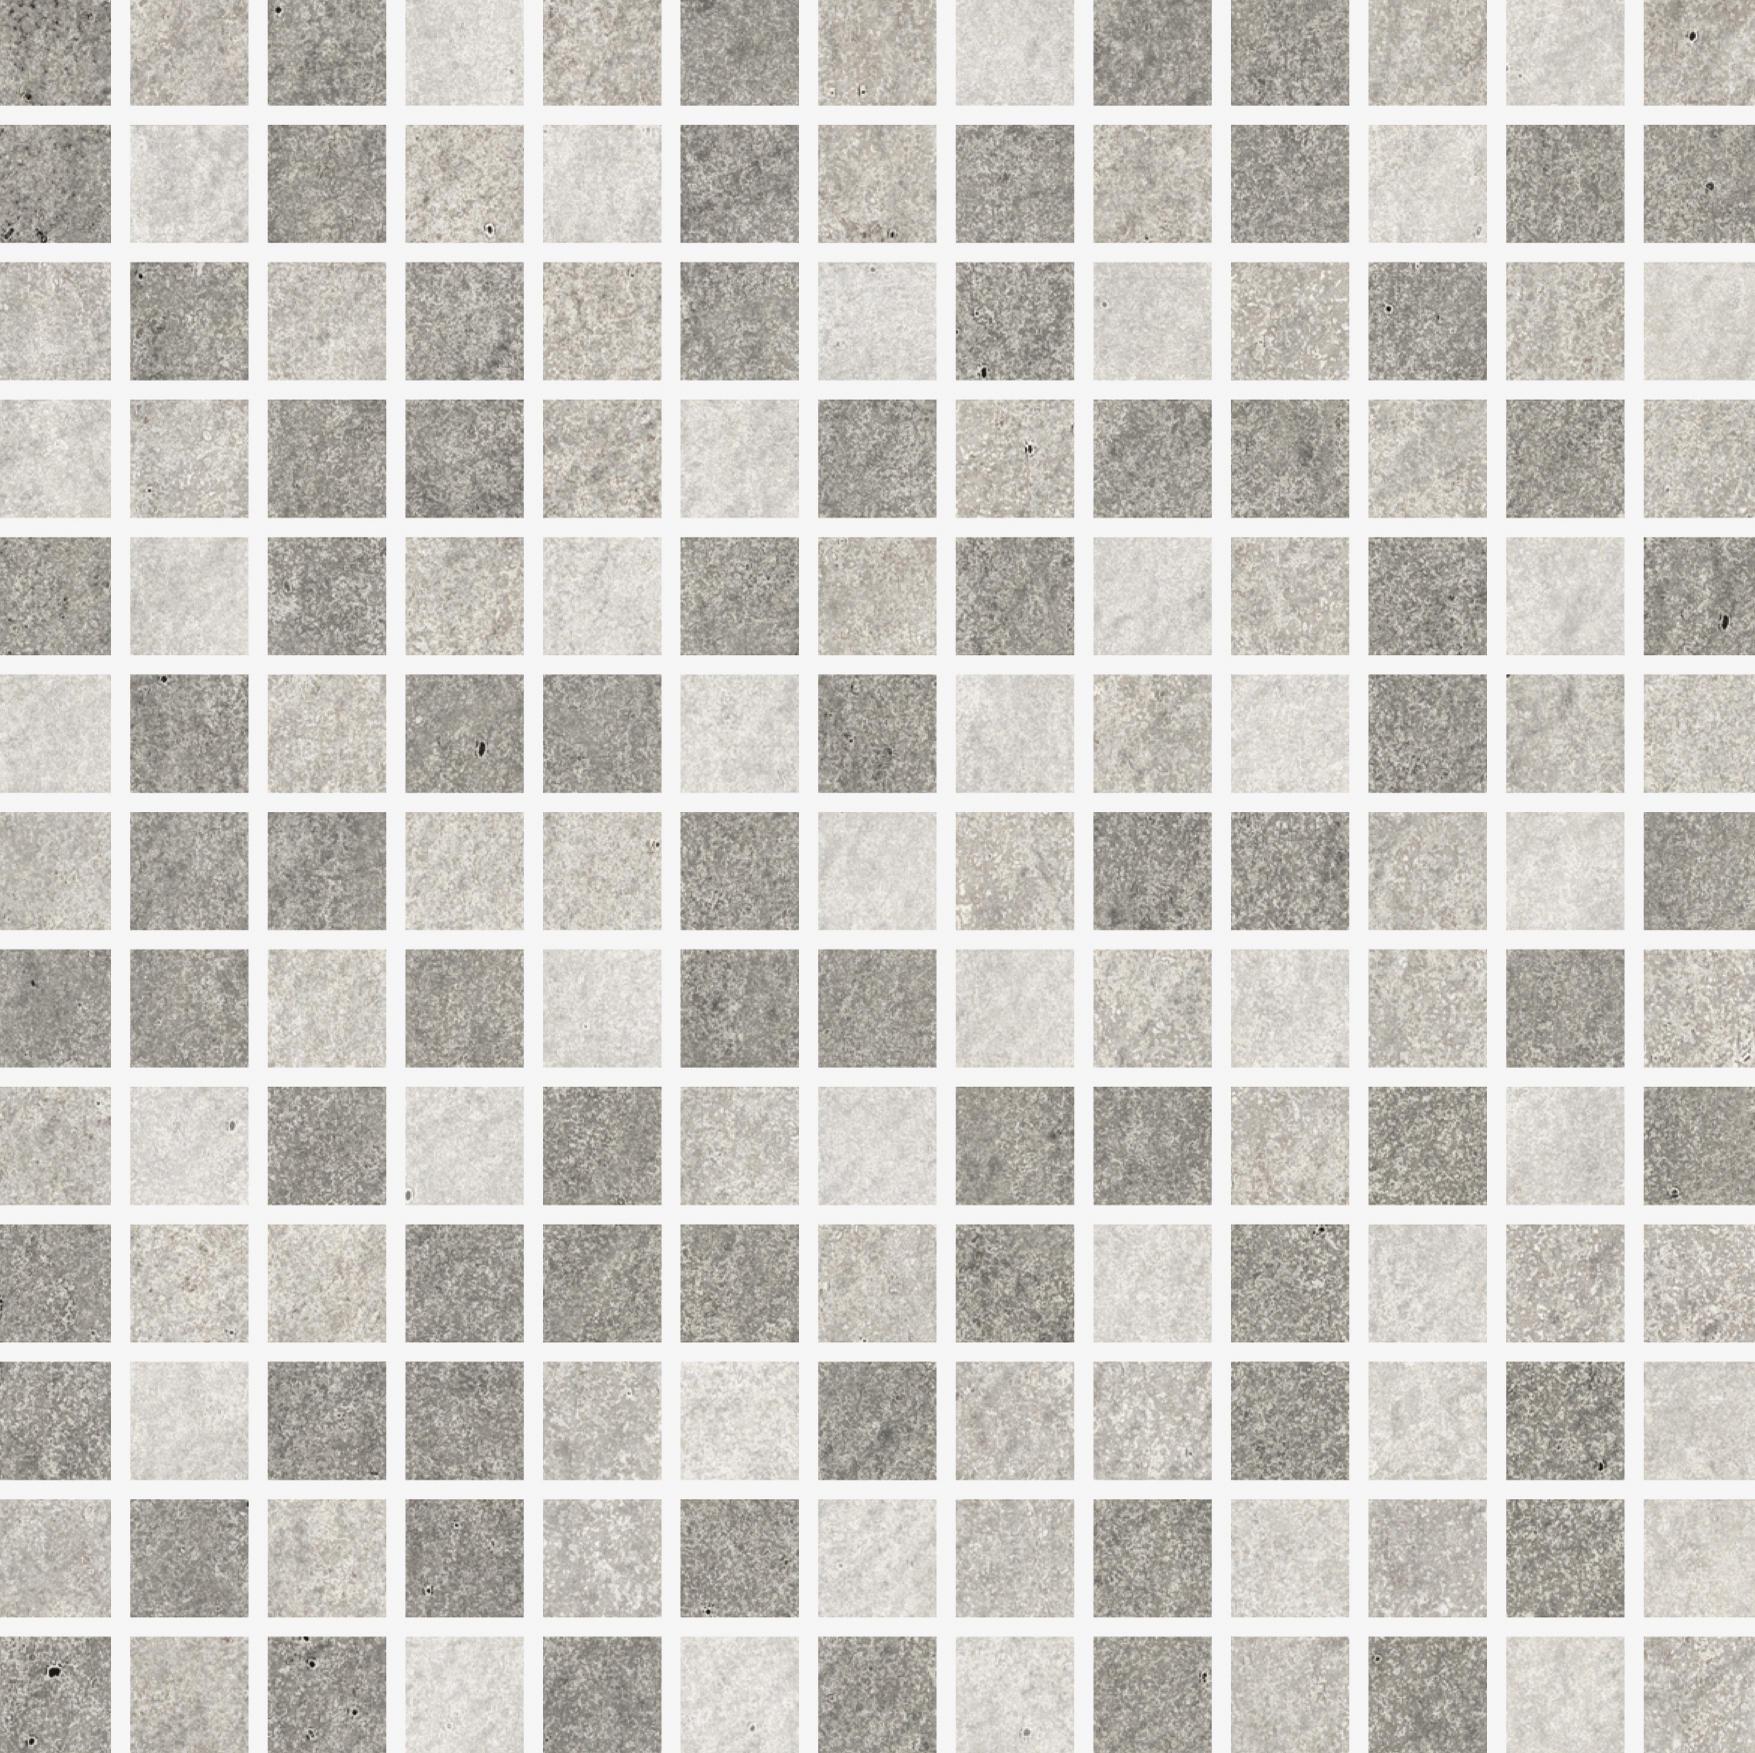 Mosaico bunker multicolor mosaicos de vives cer mica for Mosaico ceramica